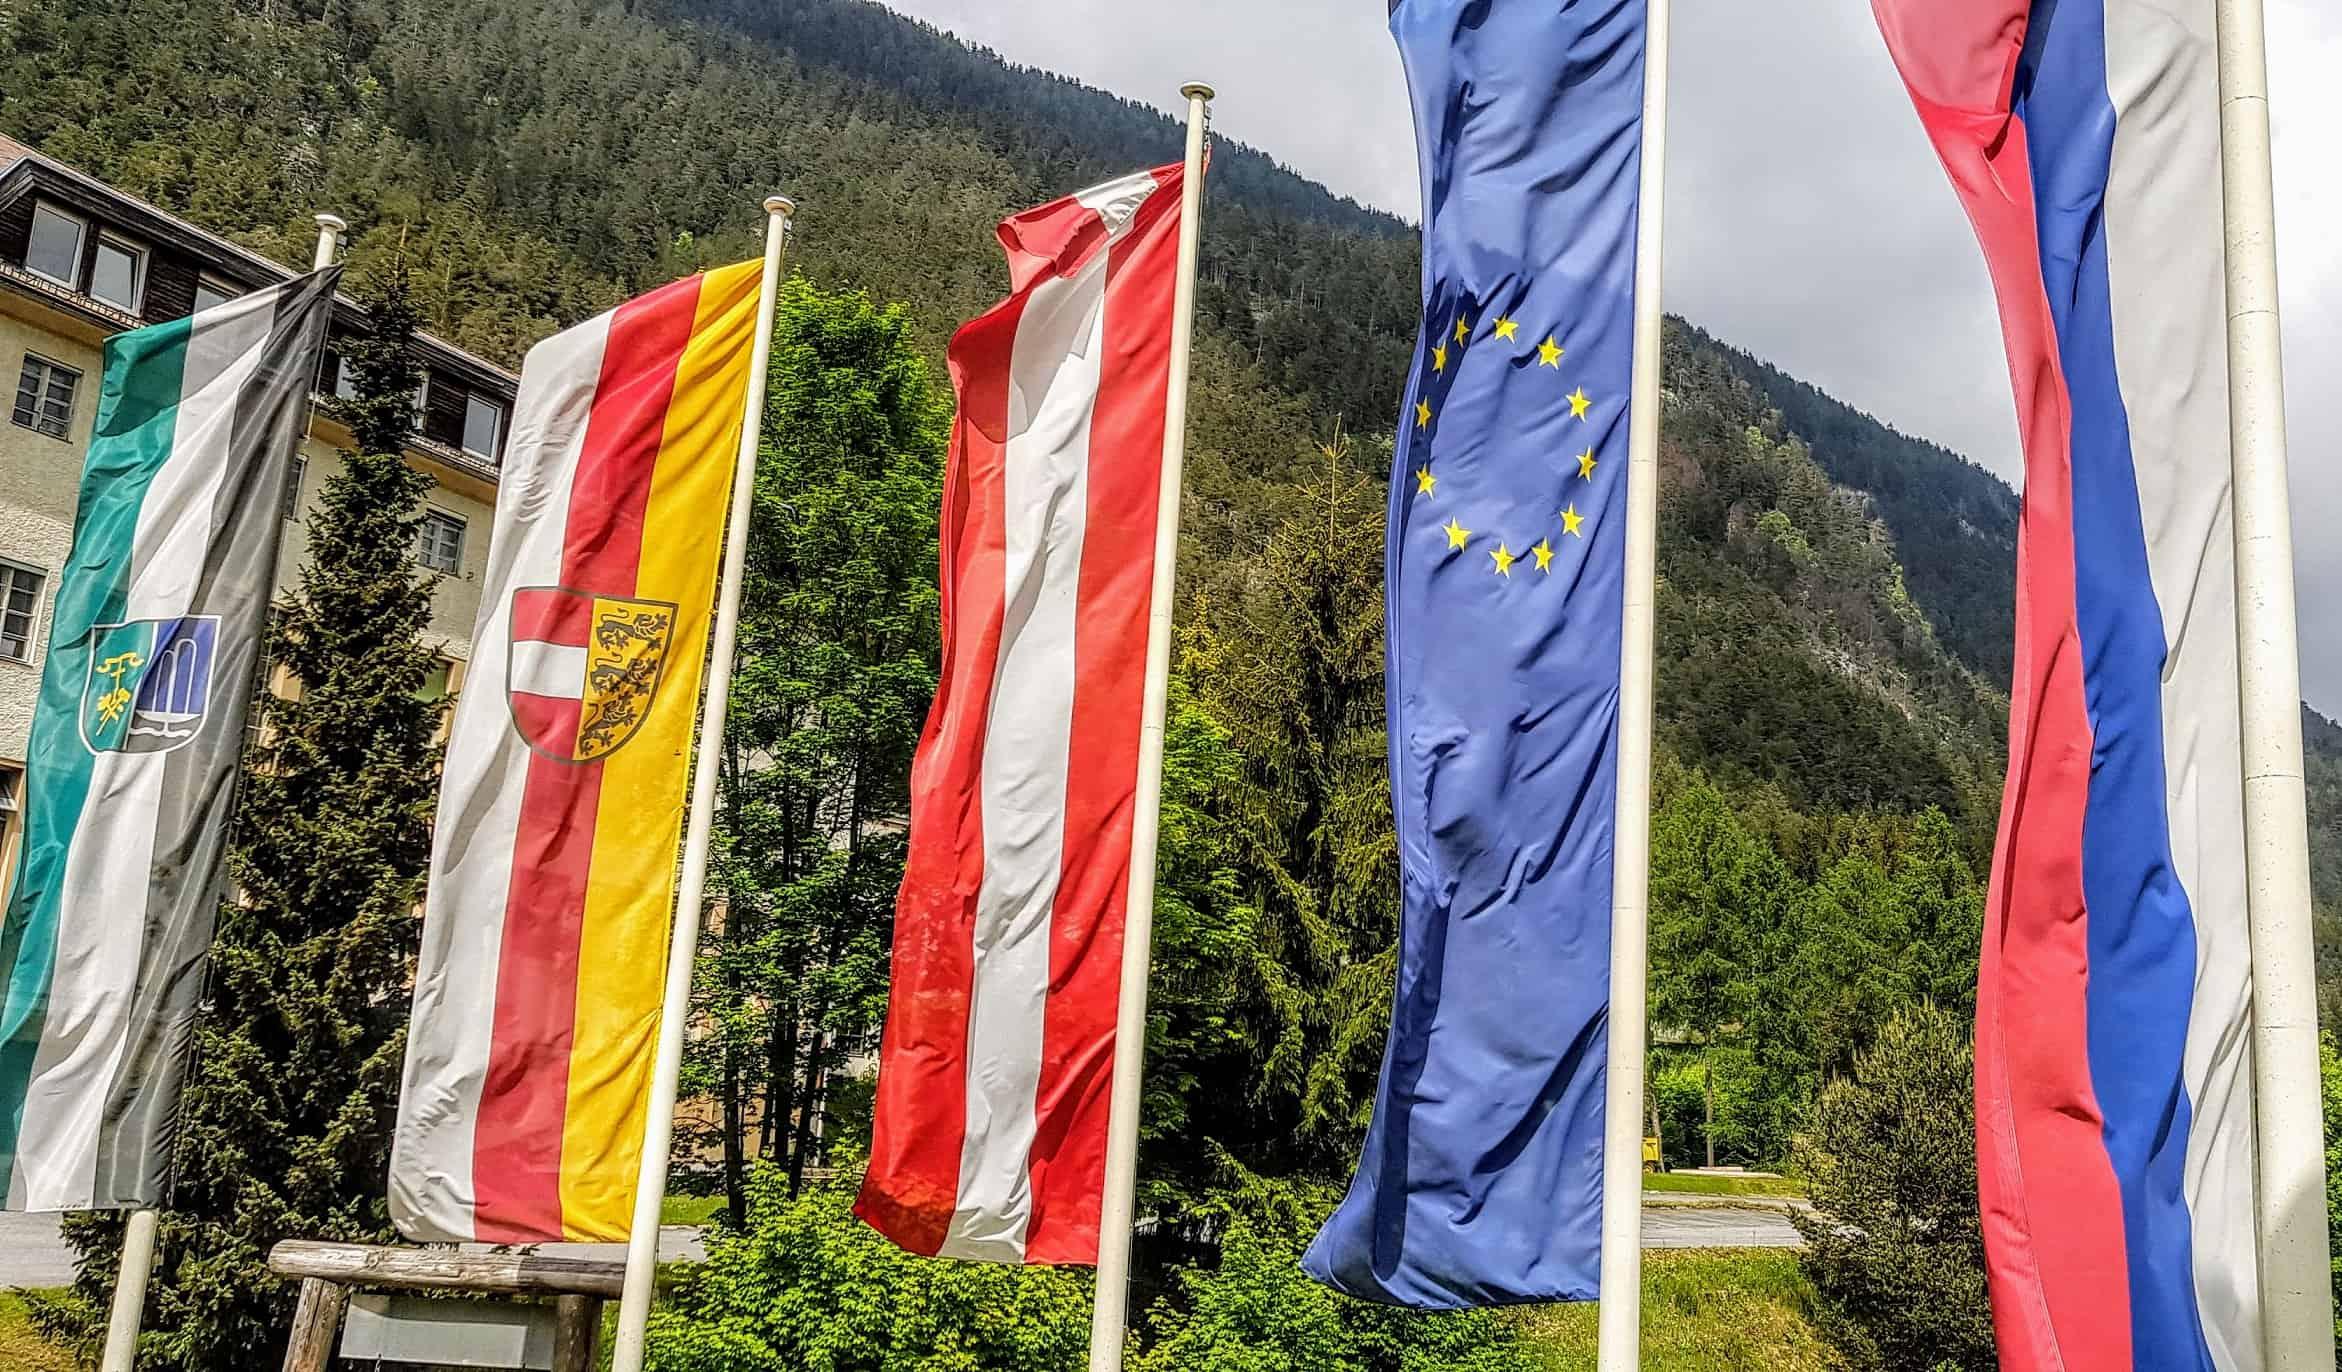 Fahnen vor den Schaubergwerken Terra Mystica & Montana in Bad Bleiberg